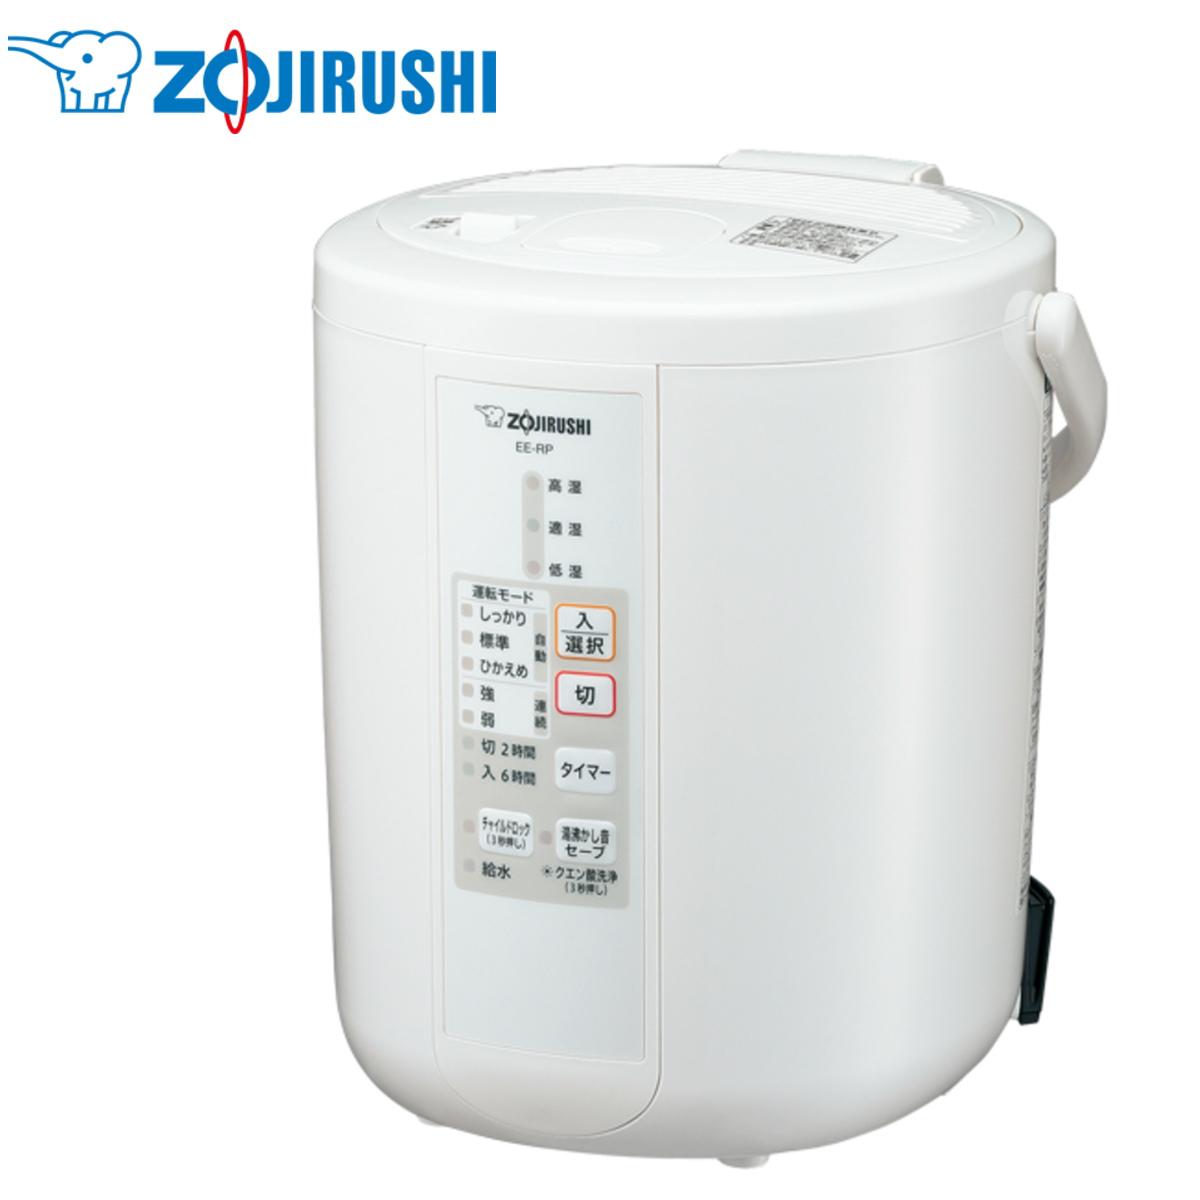 ZOJIRUSHI 象印 スチーム式 加湿器 ホワイト EE-RP35-WA